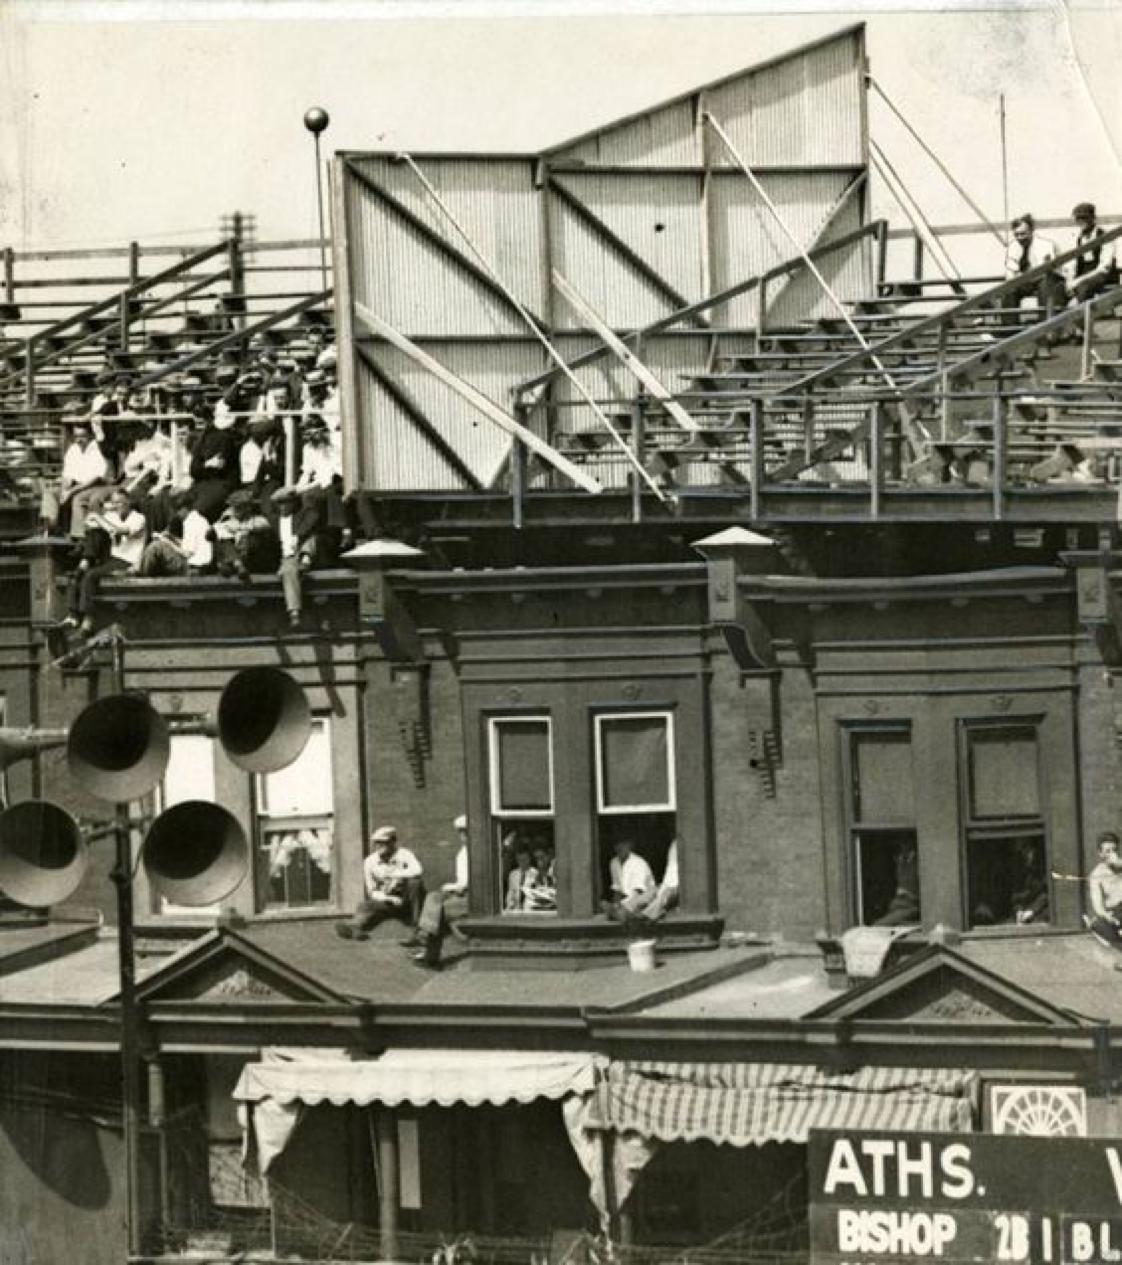 Shibe Park Philadelphia Ca 1925 Nice Look At Legendary